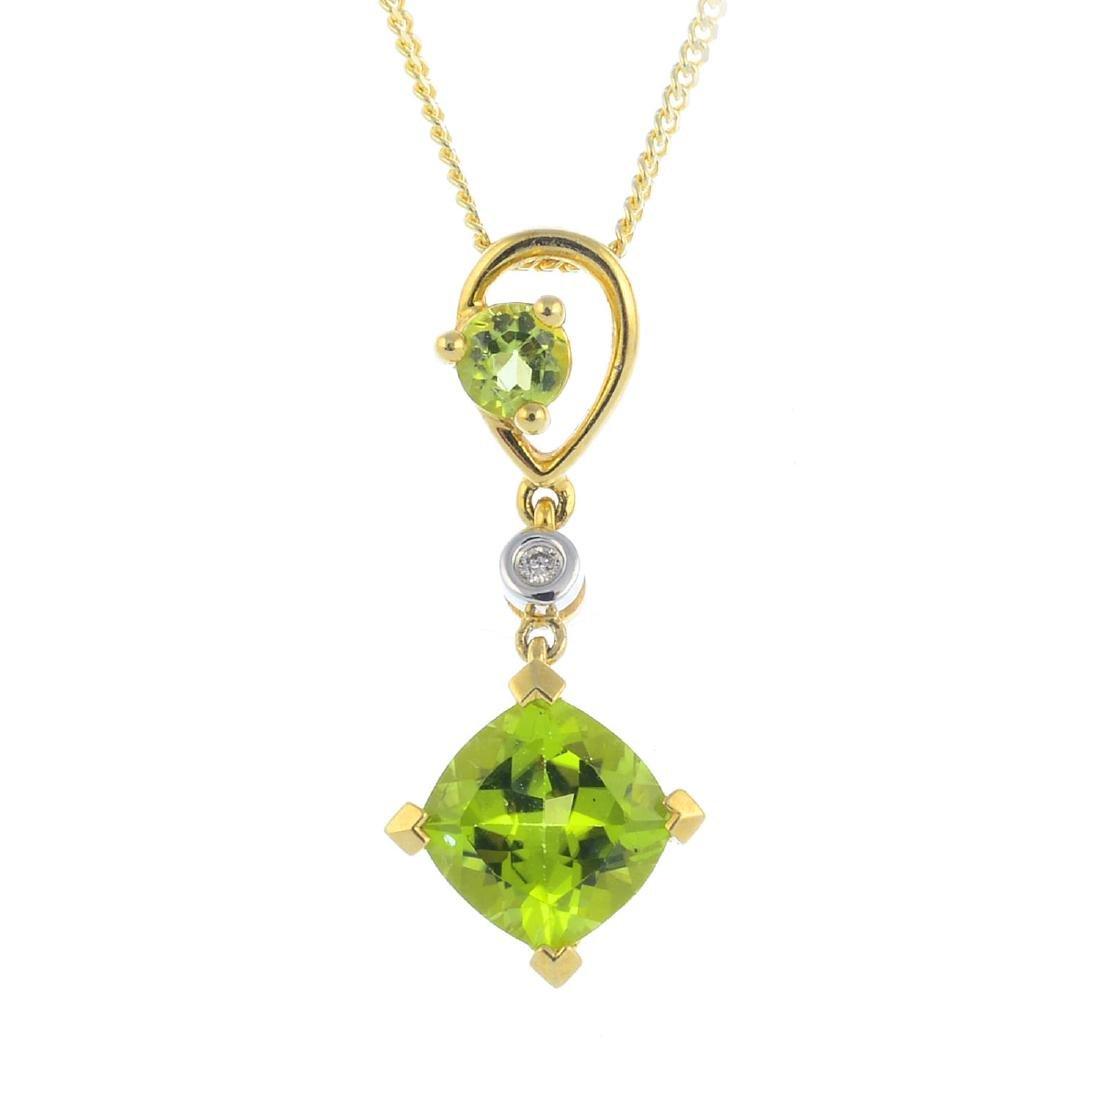 A 9ct gold peridot and diamond pendant. The